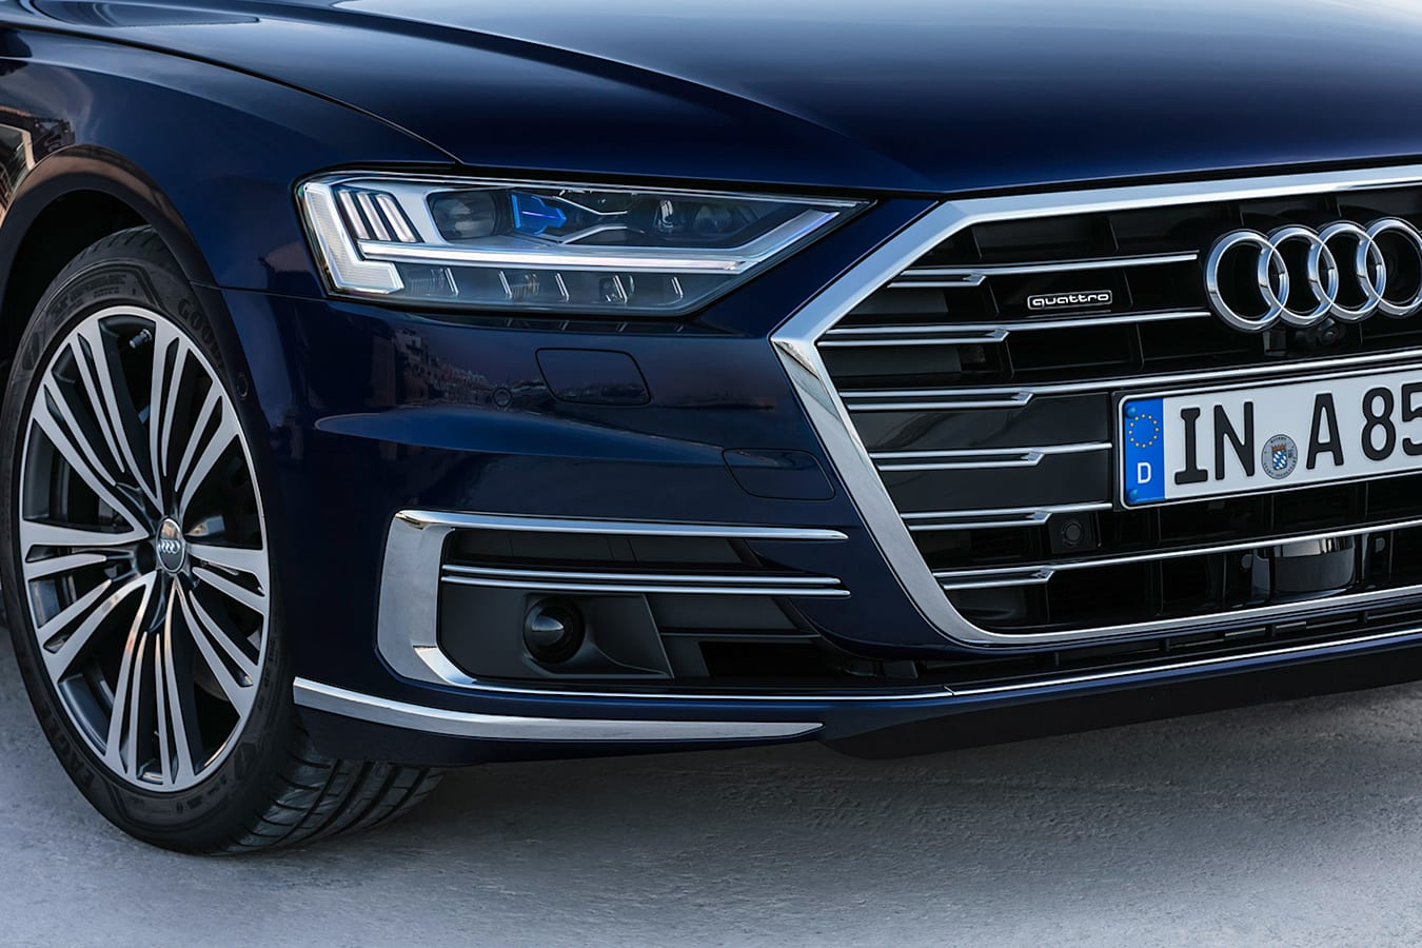 Audi A 8 Grille Jpg